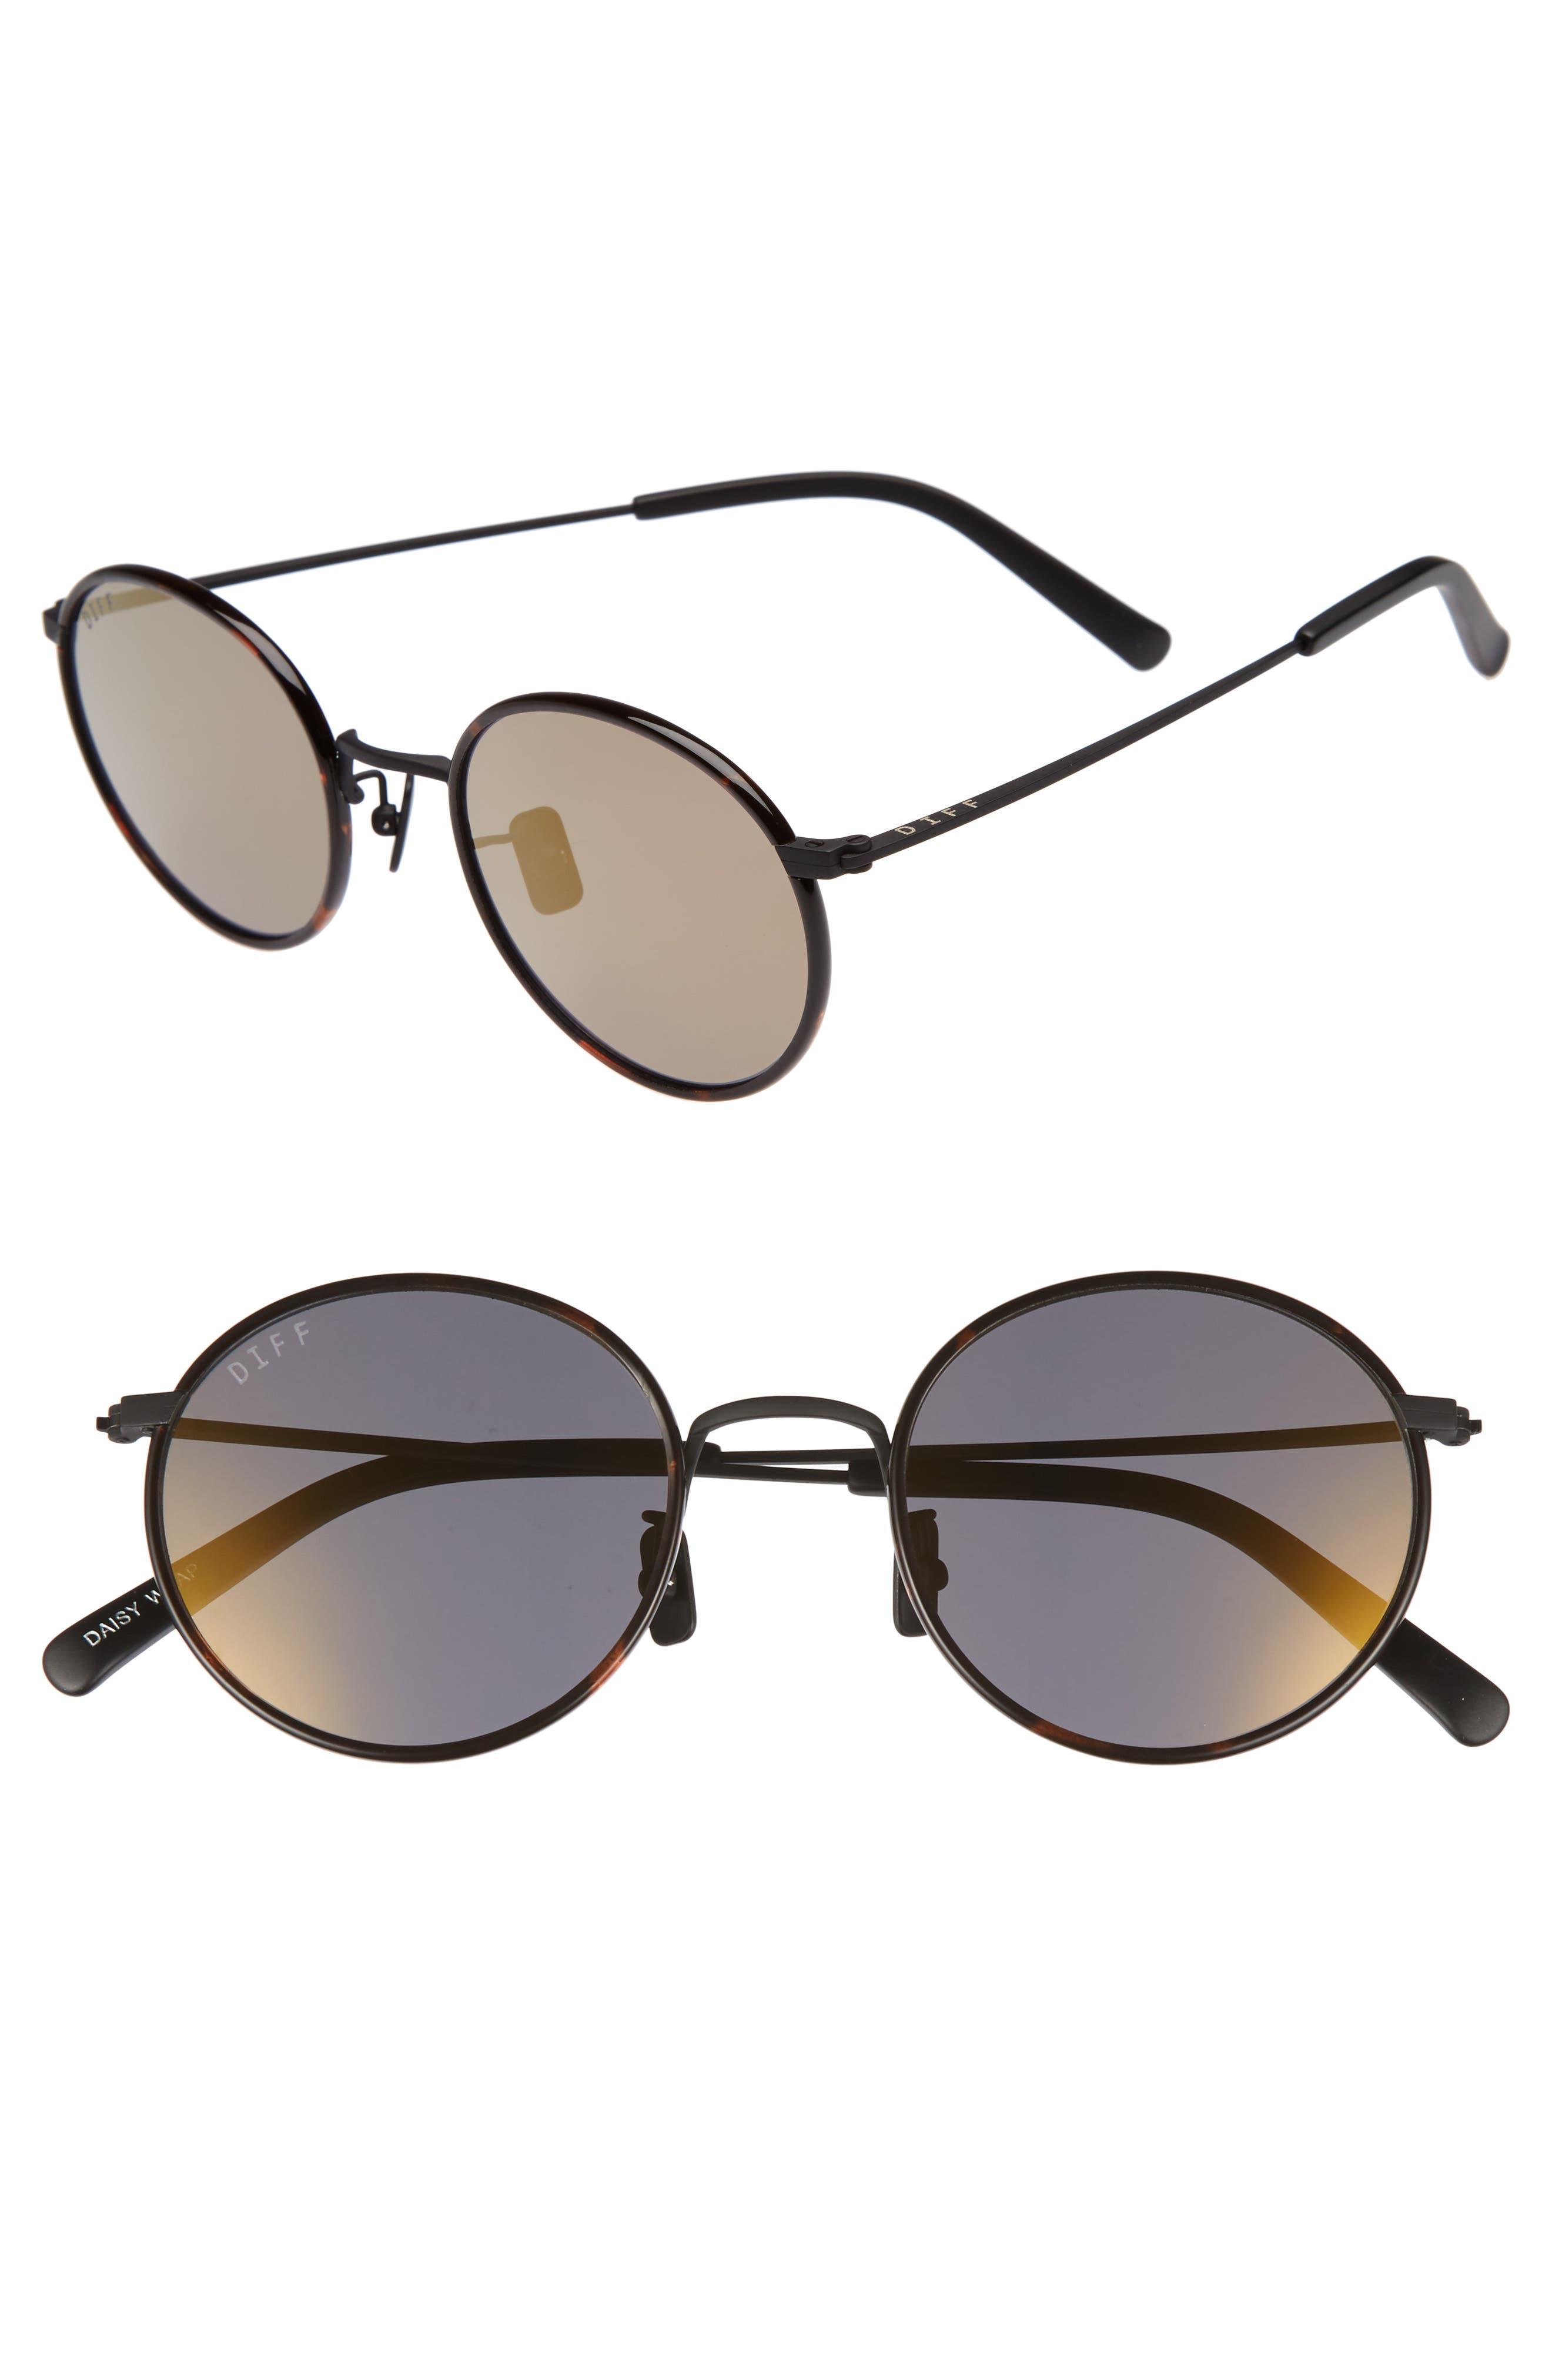 Daisy 57mm Polarized Round Lens Sunglasses,                         Main,                         color, Matte Black/ Grey Blue